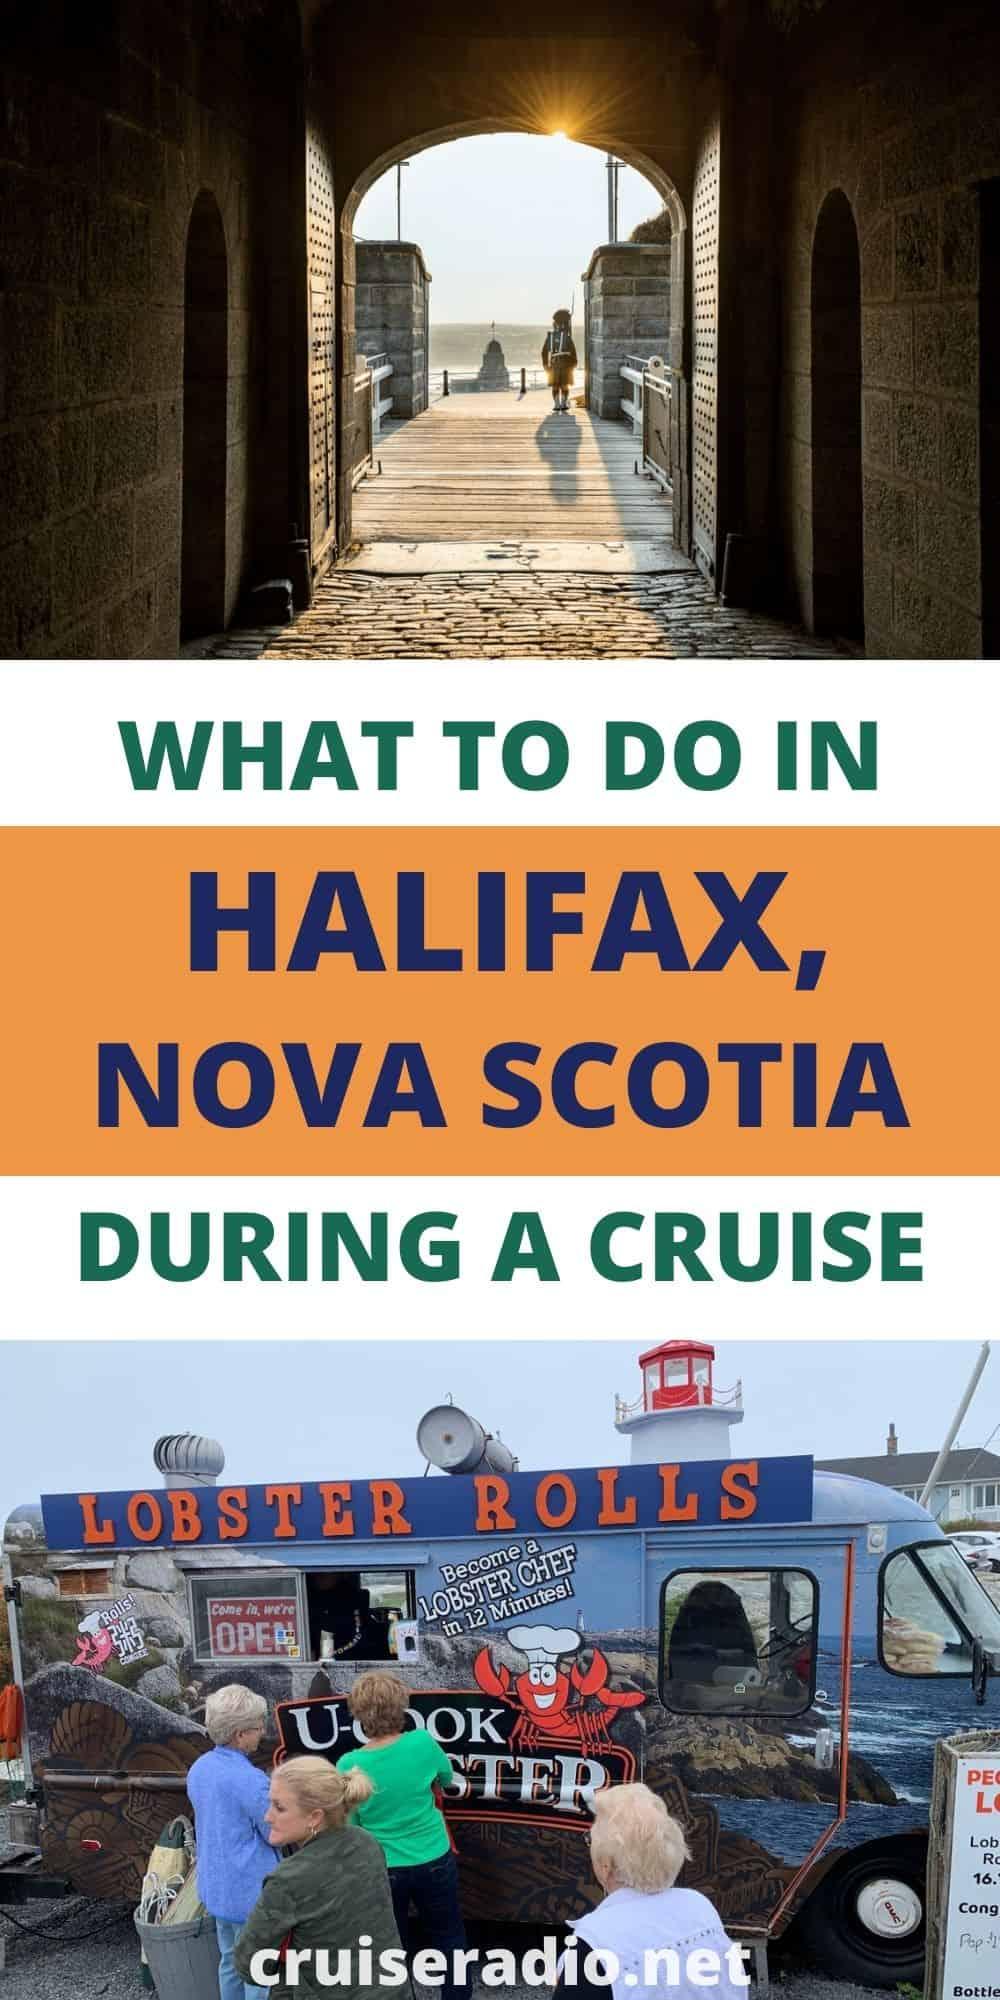 halifax nova scotia cruise what to do